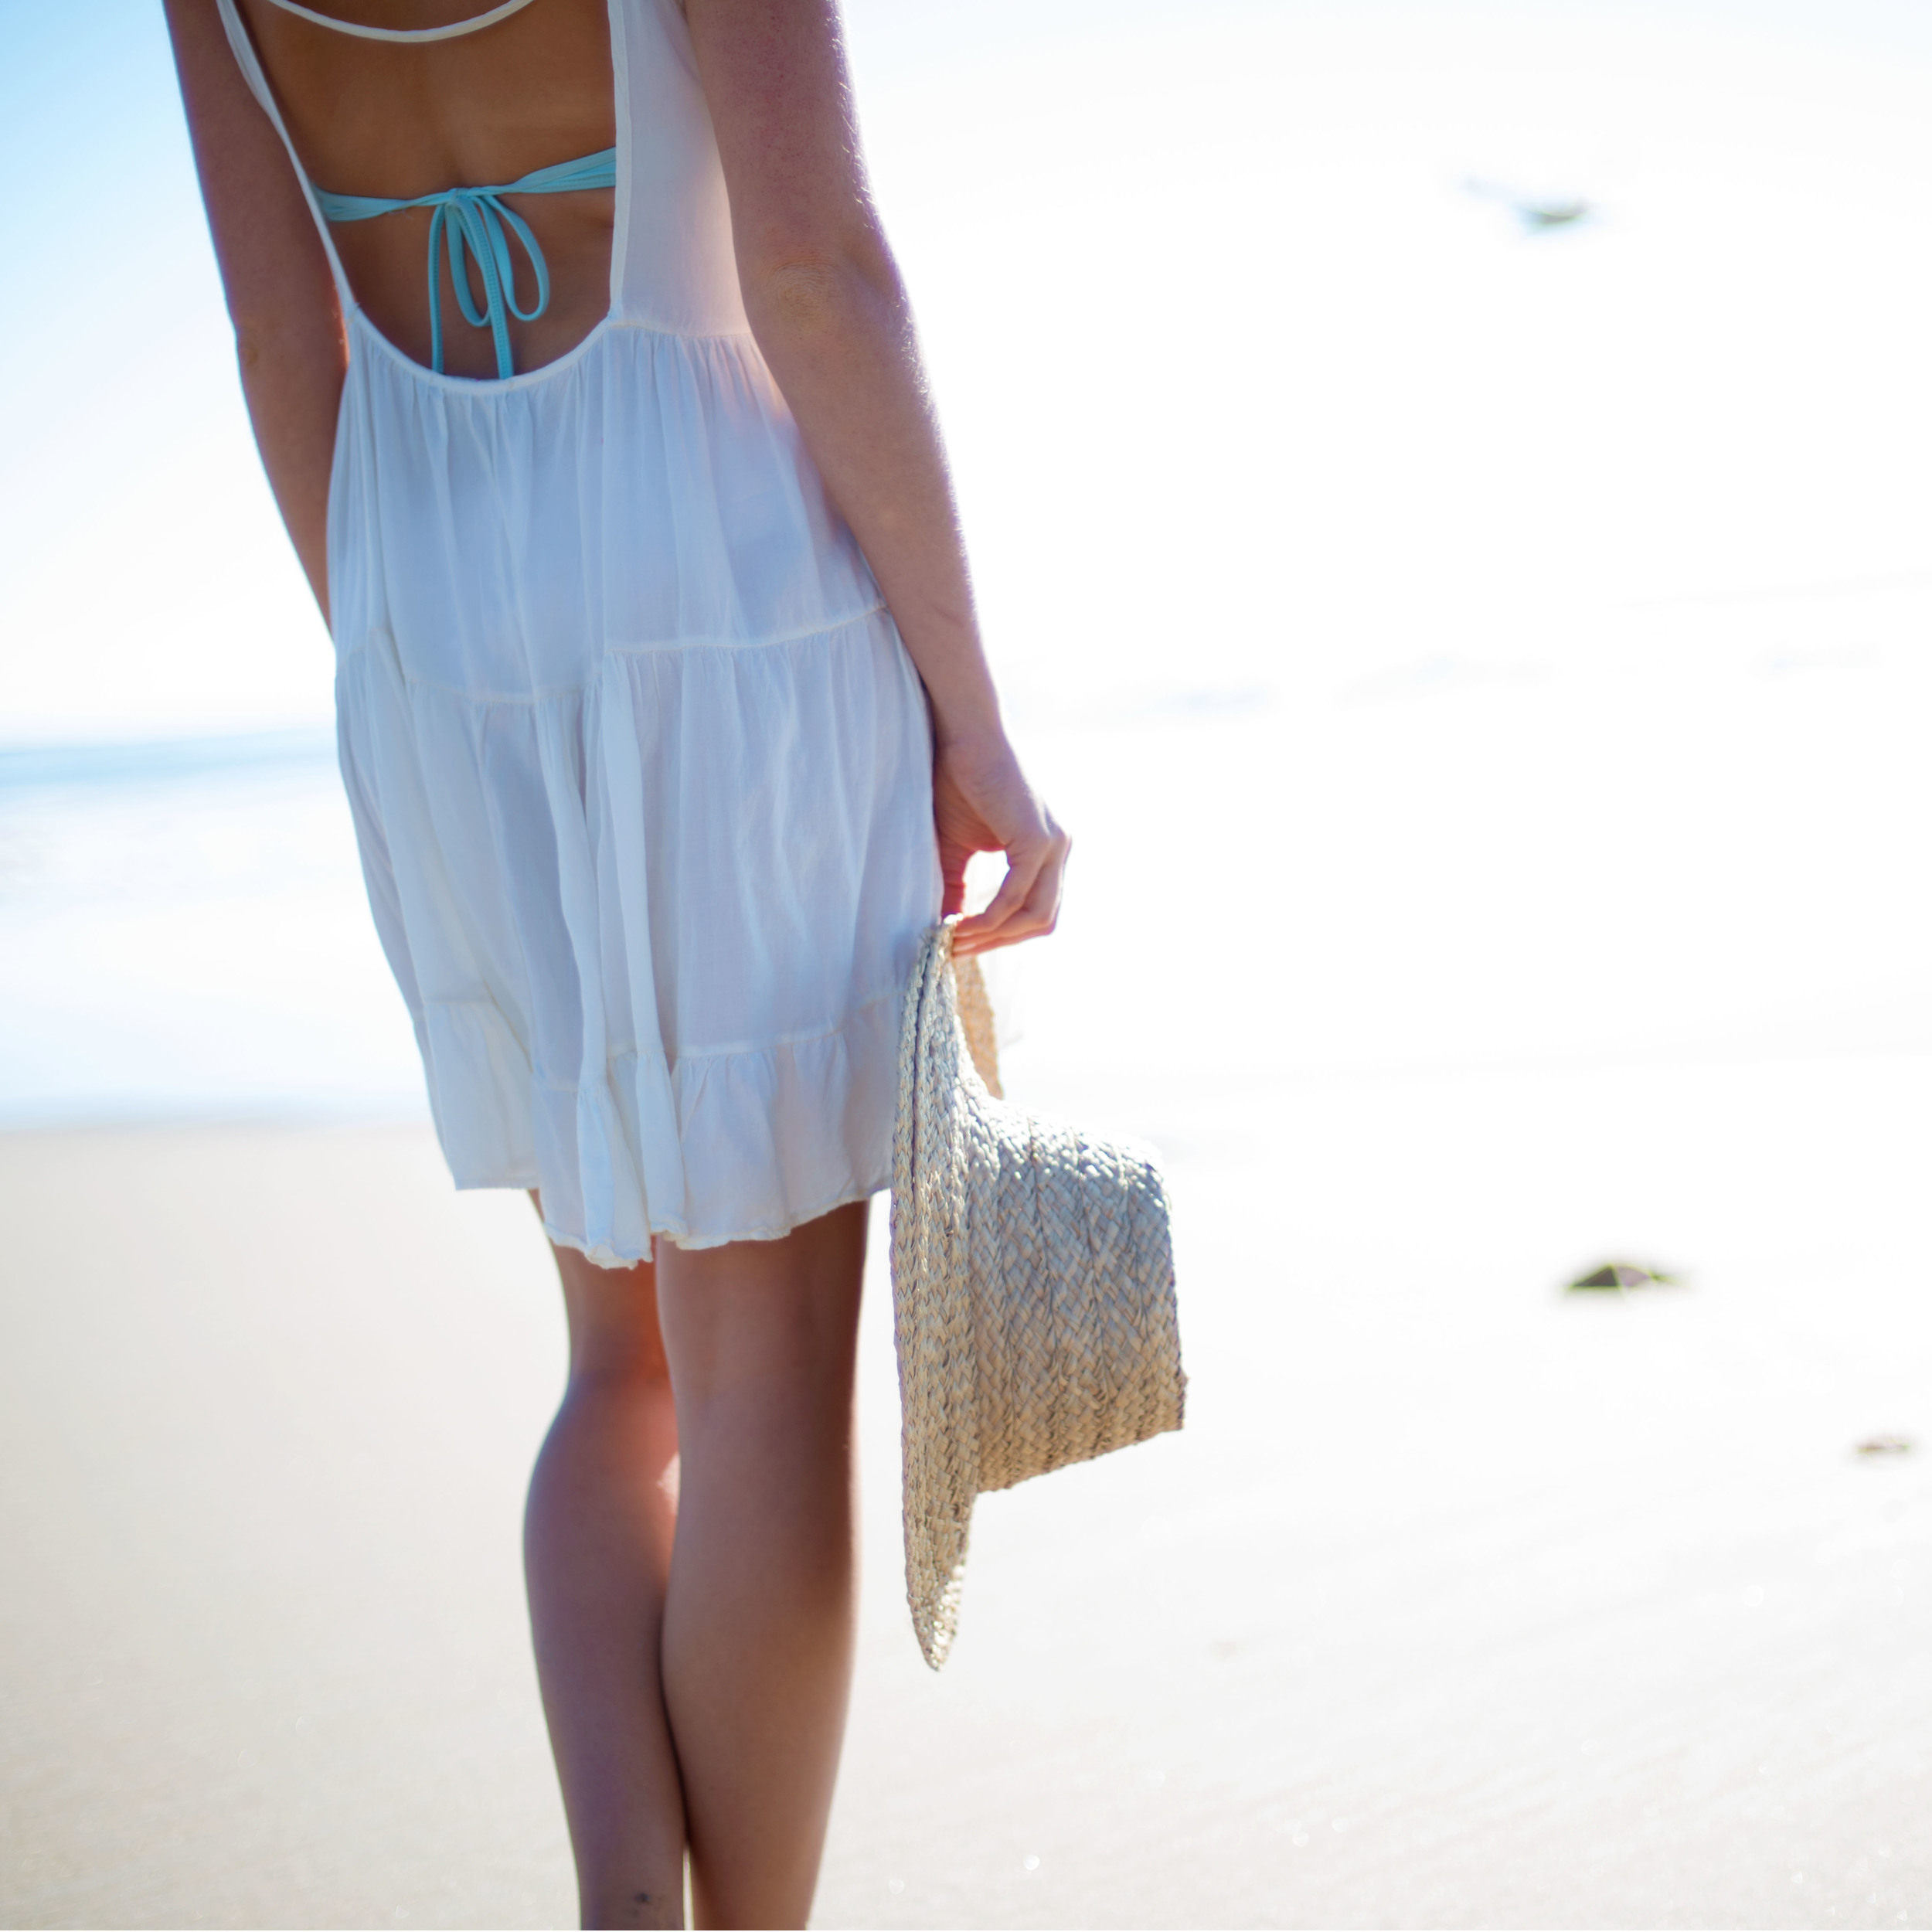 Walk On The Beach 0721.edit.jpg